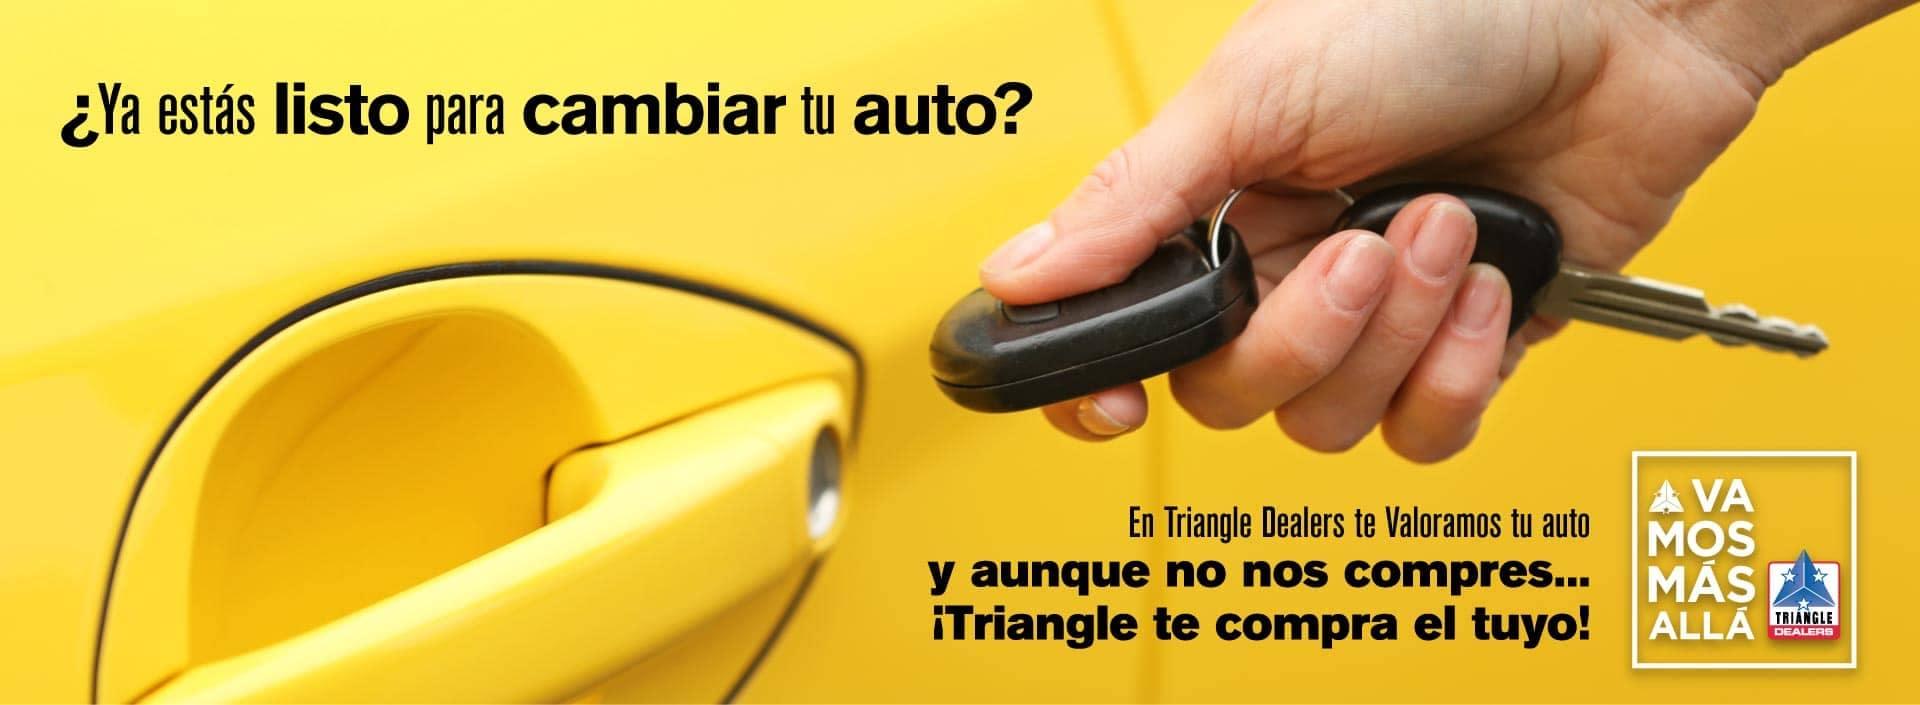 Triangle Nissan Banner - Ya estas listo para cambiar tu auto